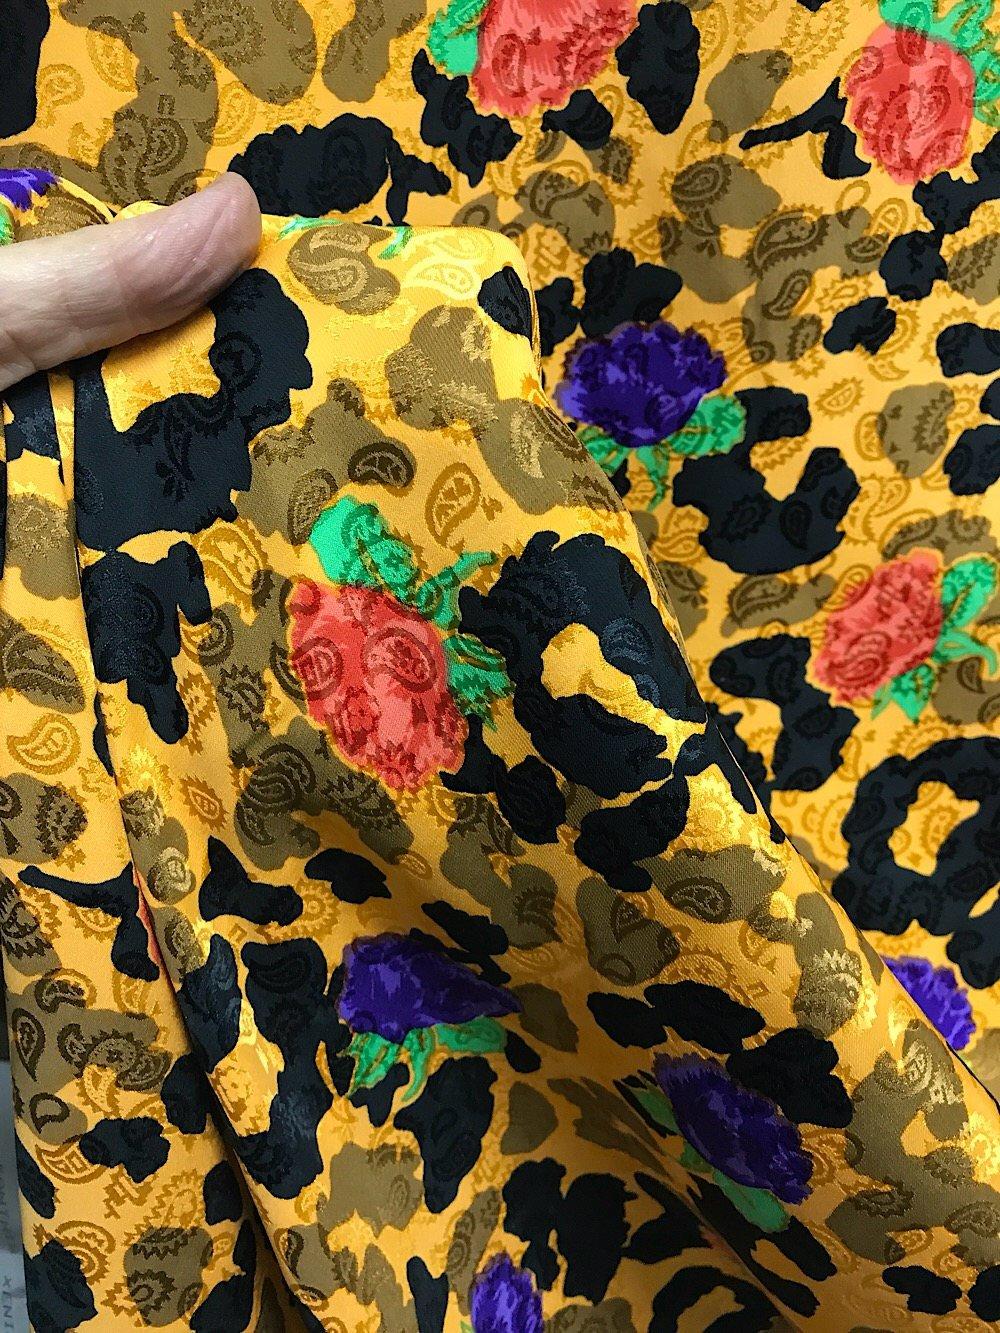 silk satin fabric abstract floral animal print for dress kaftan Kimono skirt blouse sewing dressmaking multi color print 120cm